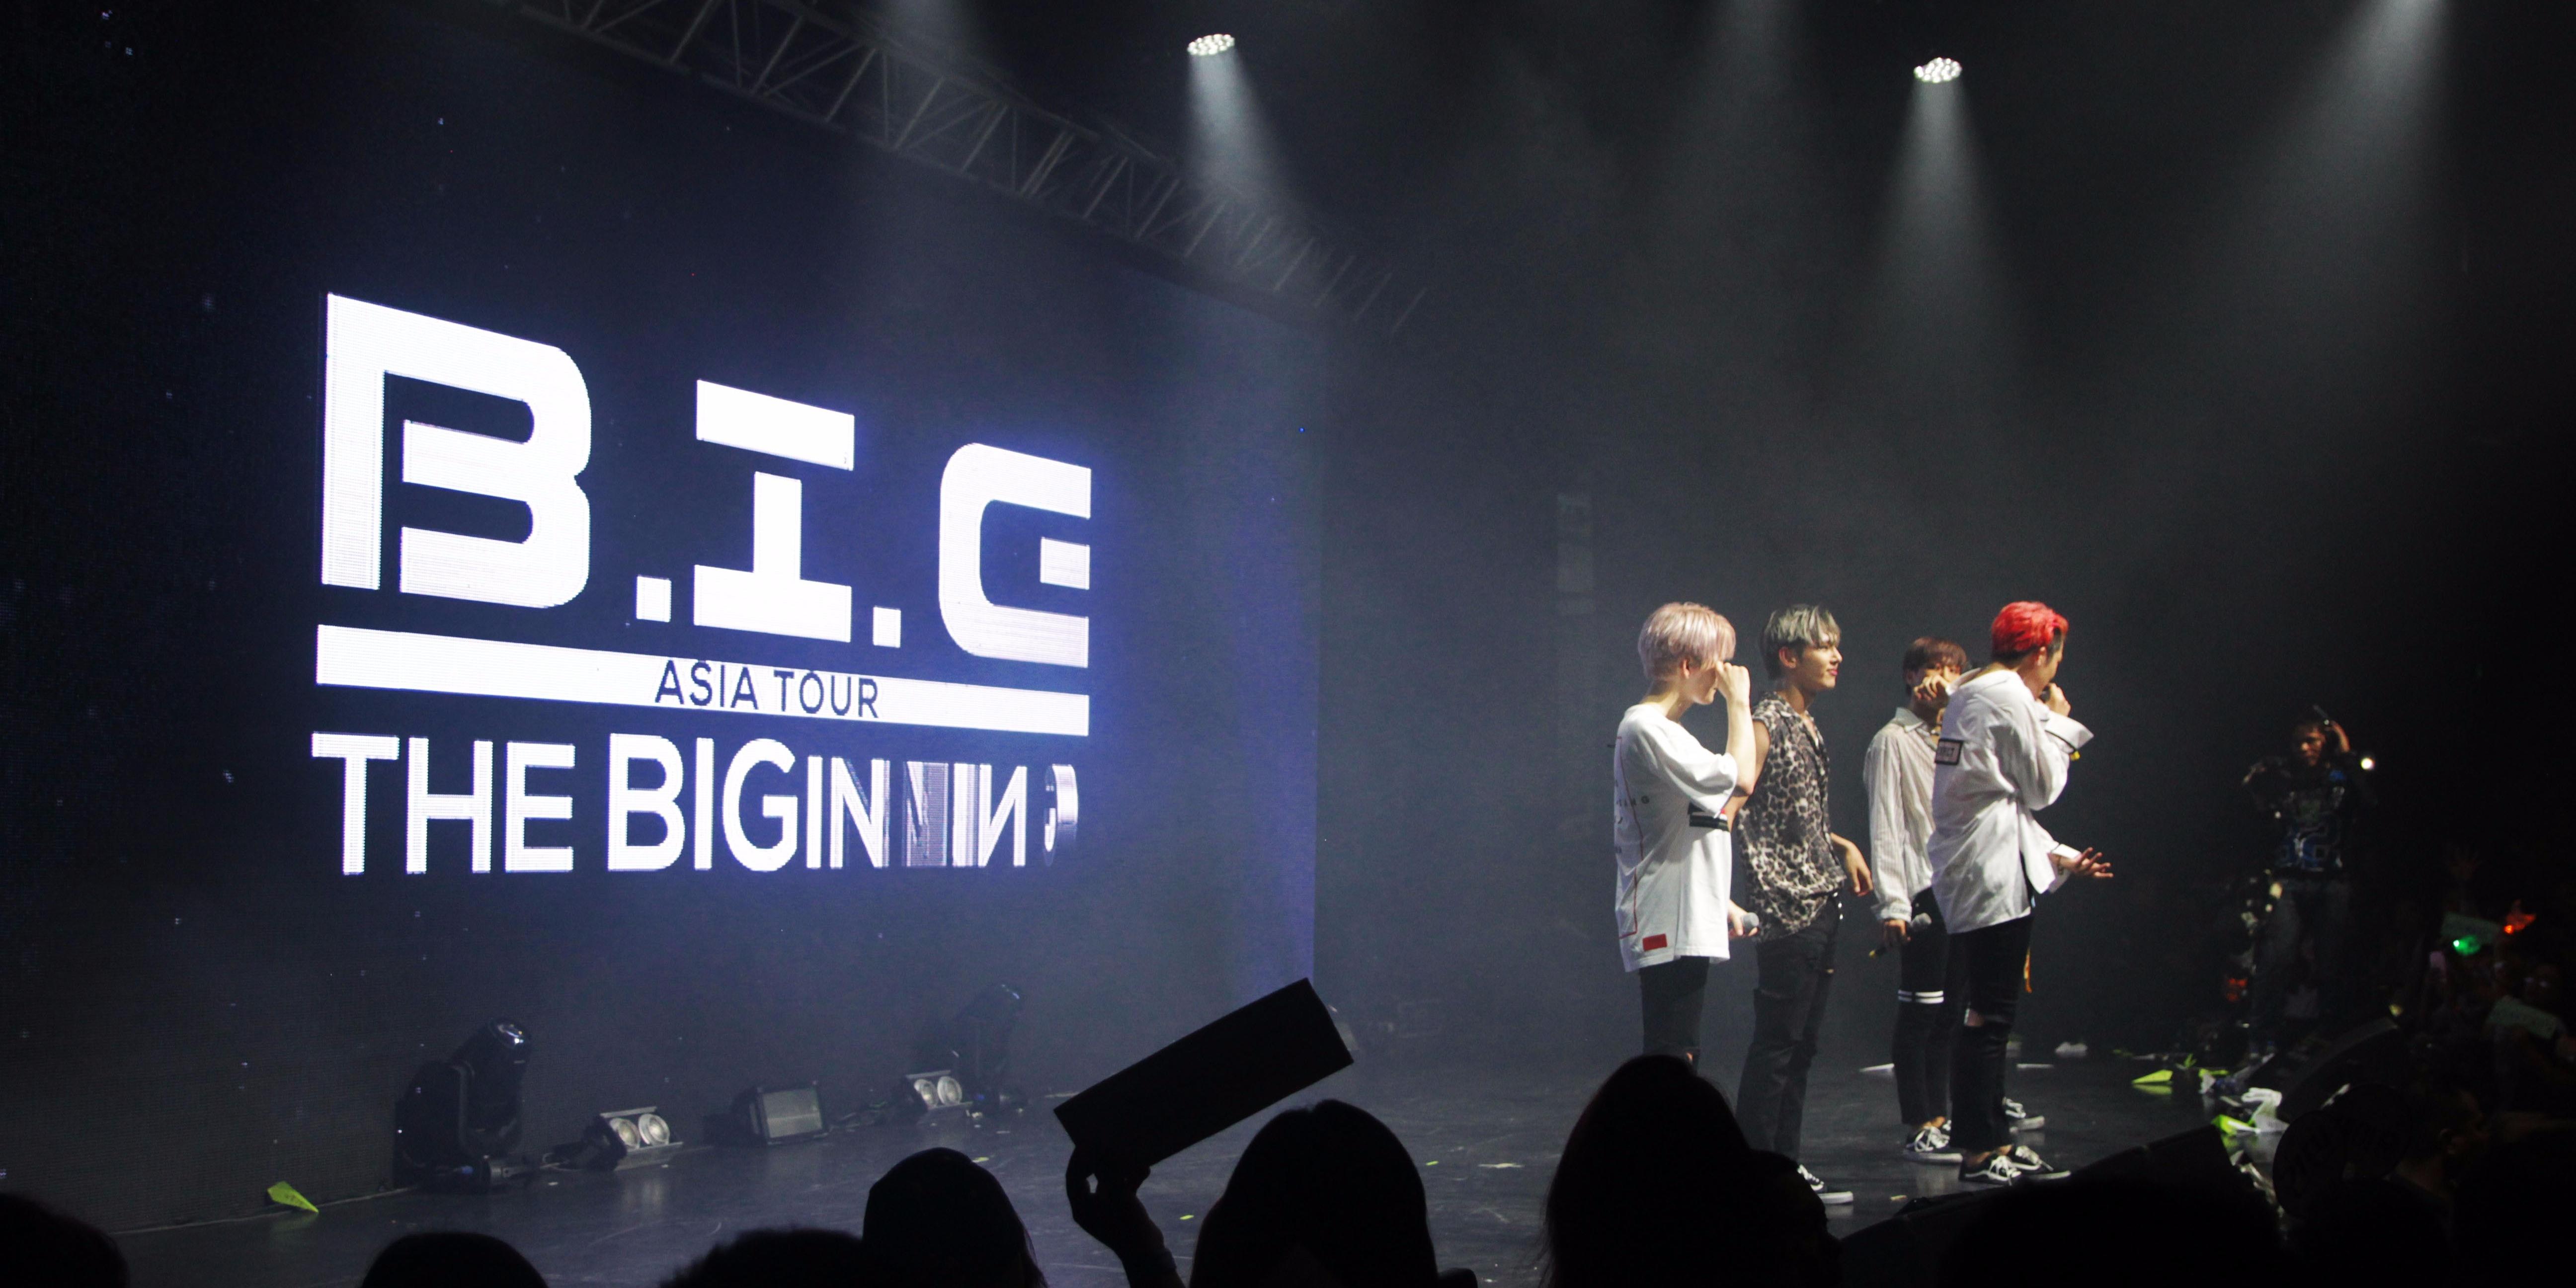 B.I.G. shared their love for Filipino BIGinnings through their heartwarming fanmeet – gig report